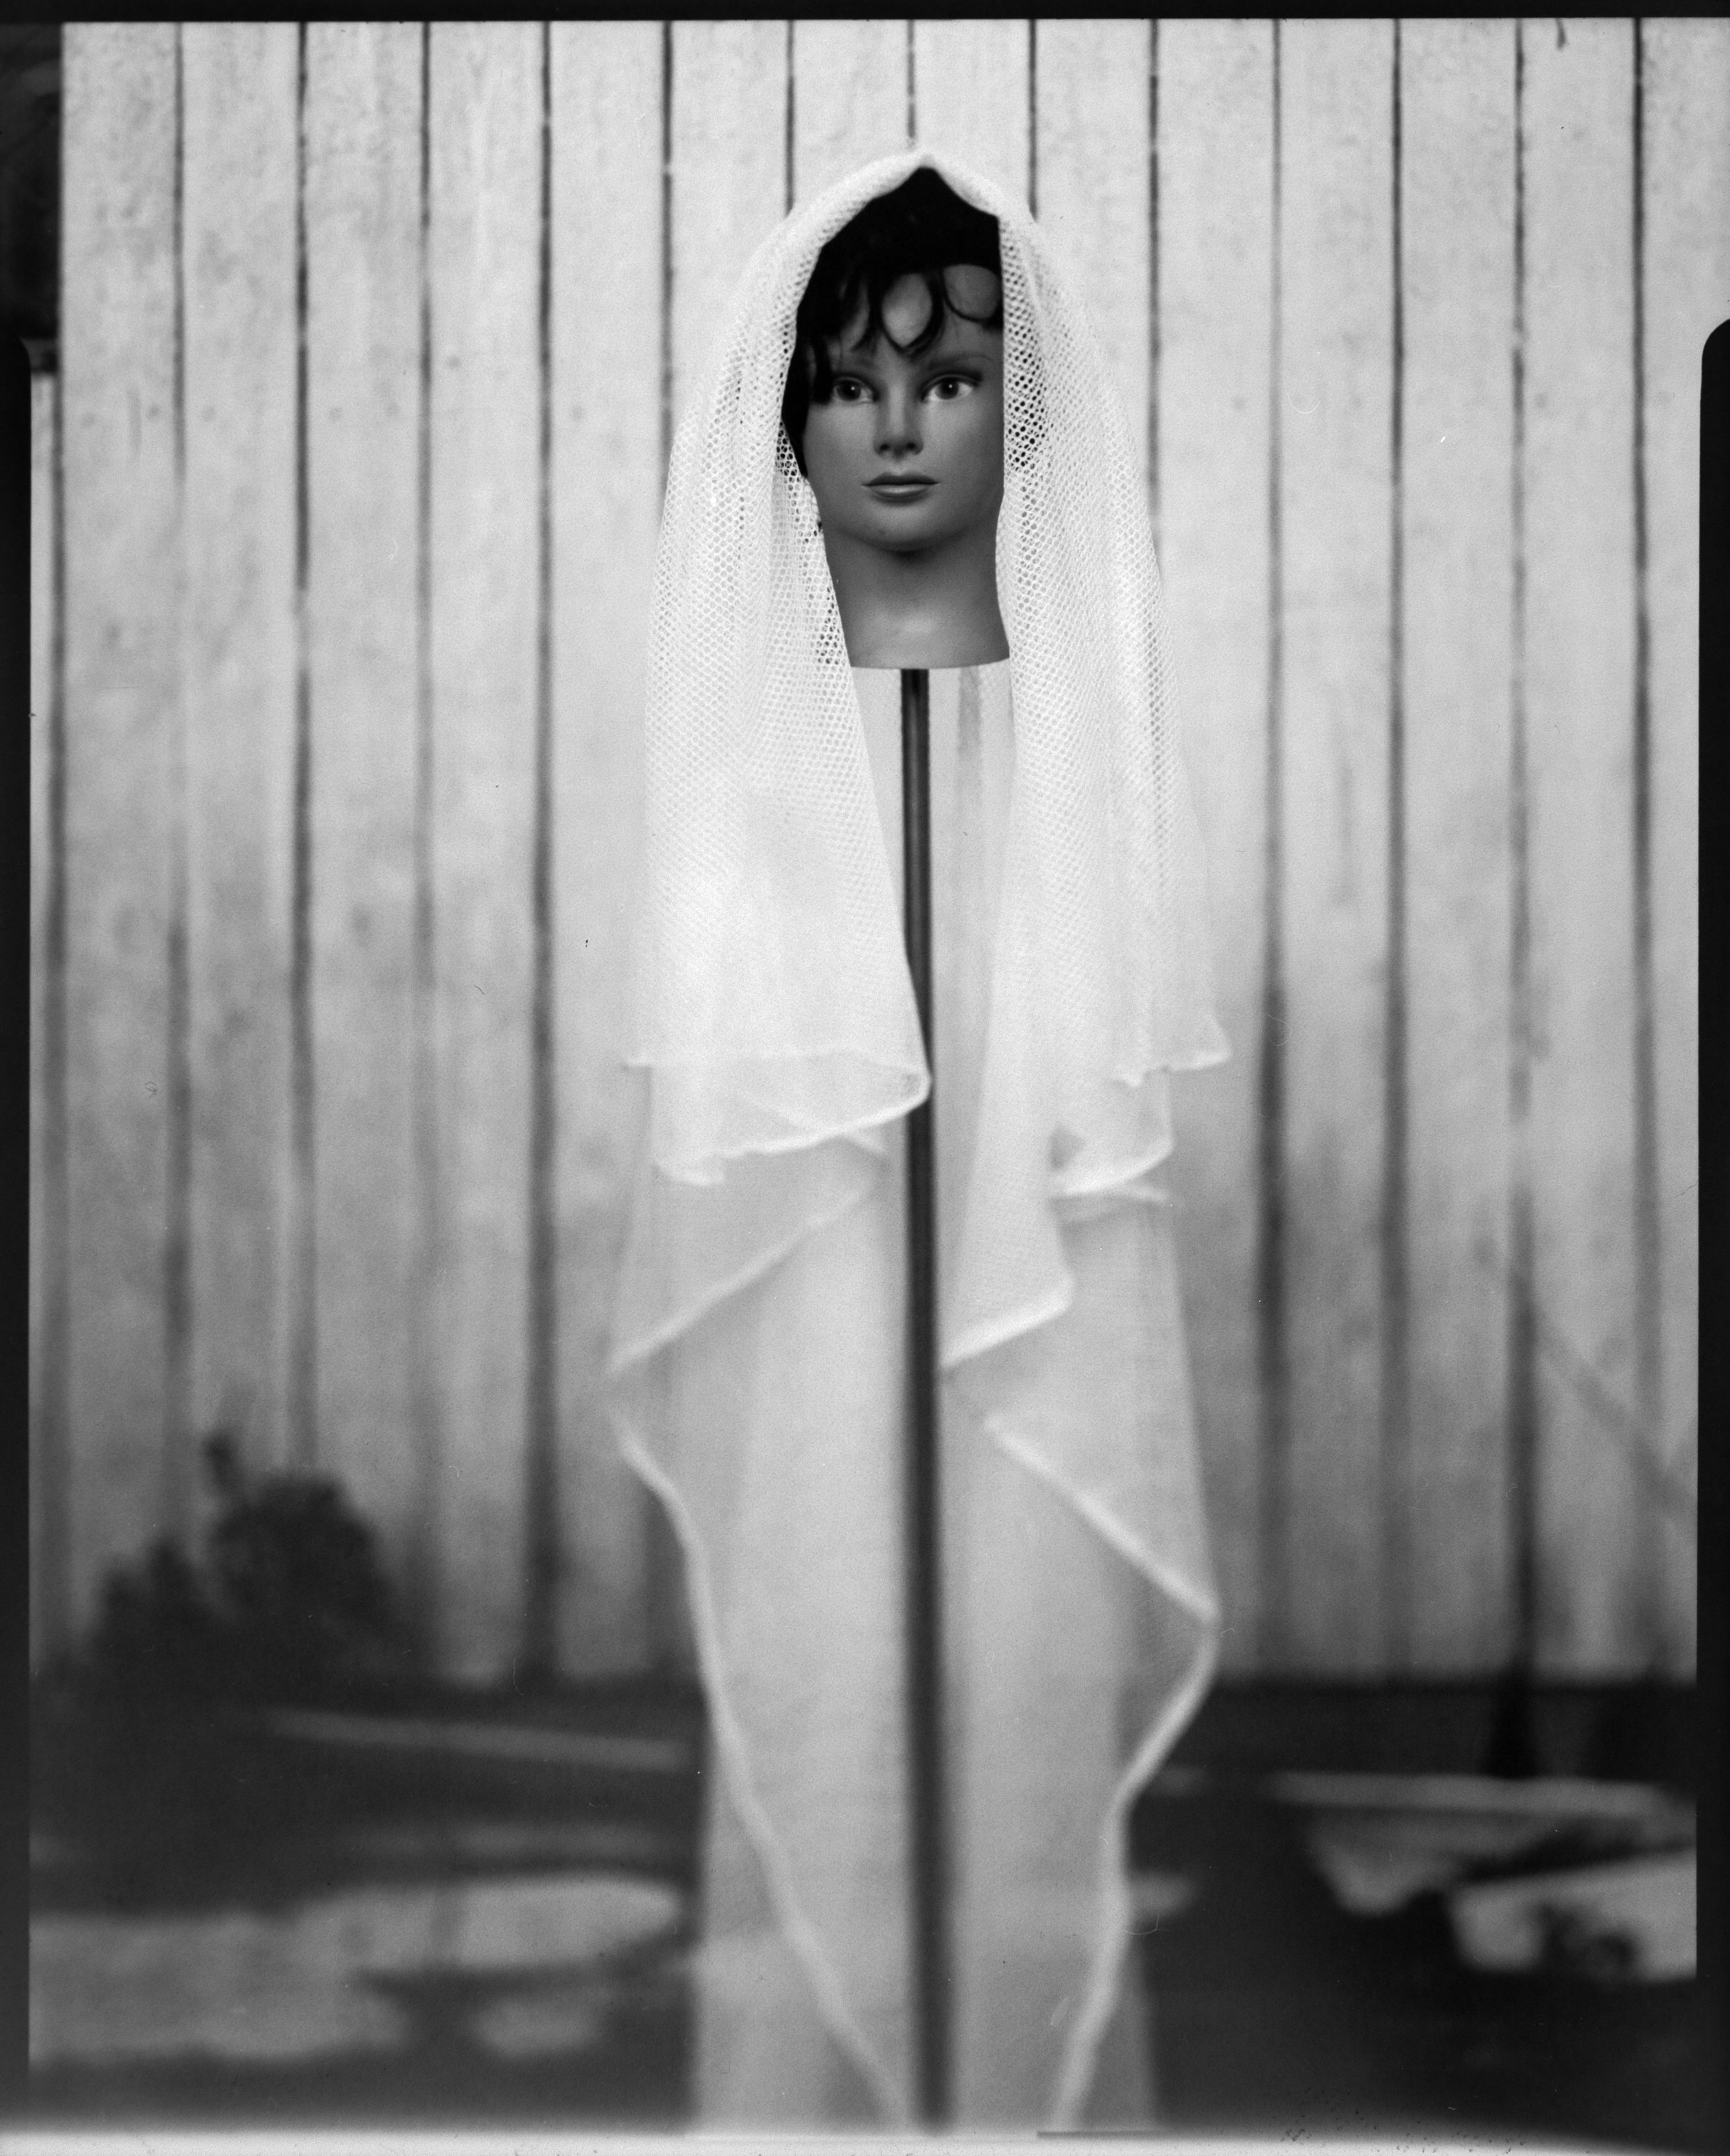 C.L. Svendsen   untitled   chamonix 45 f2 240mm   paper negative